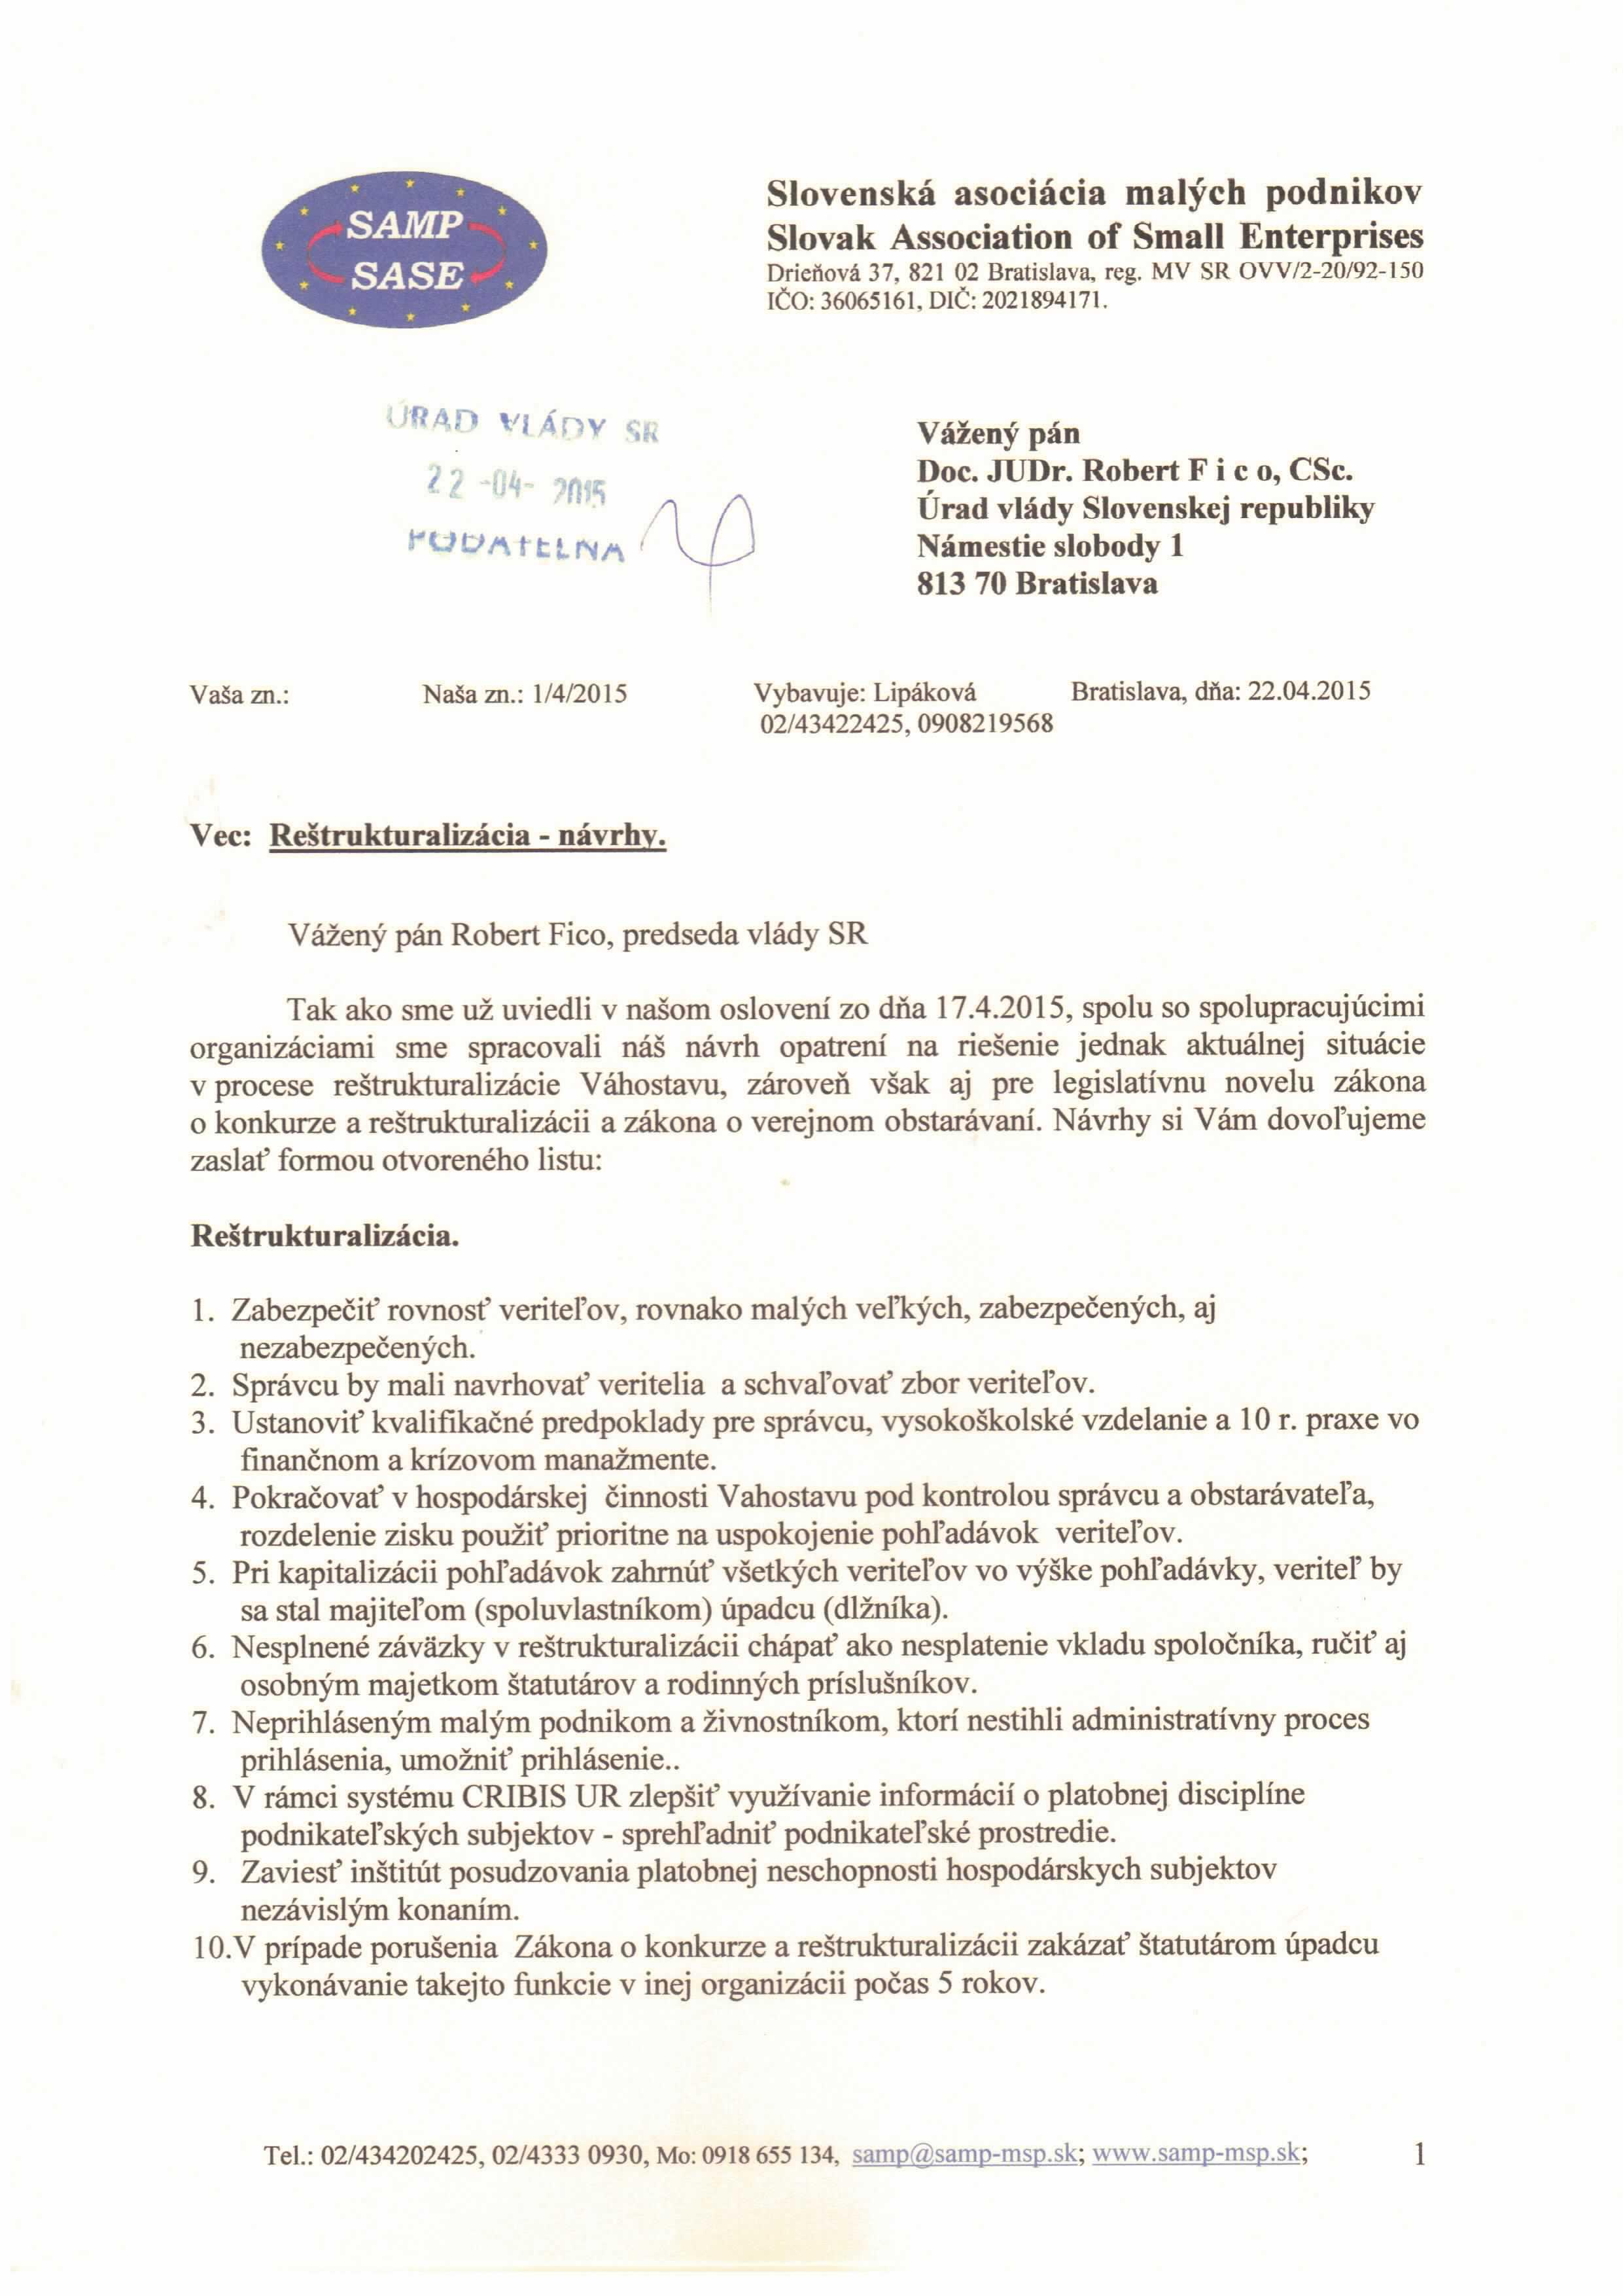 Reštrukturalizácia -návrhy